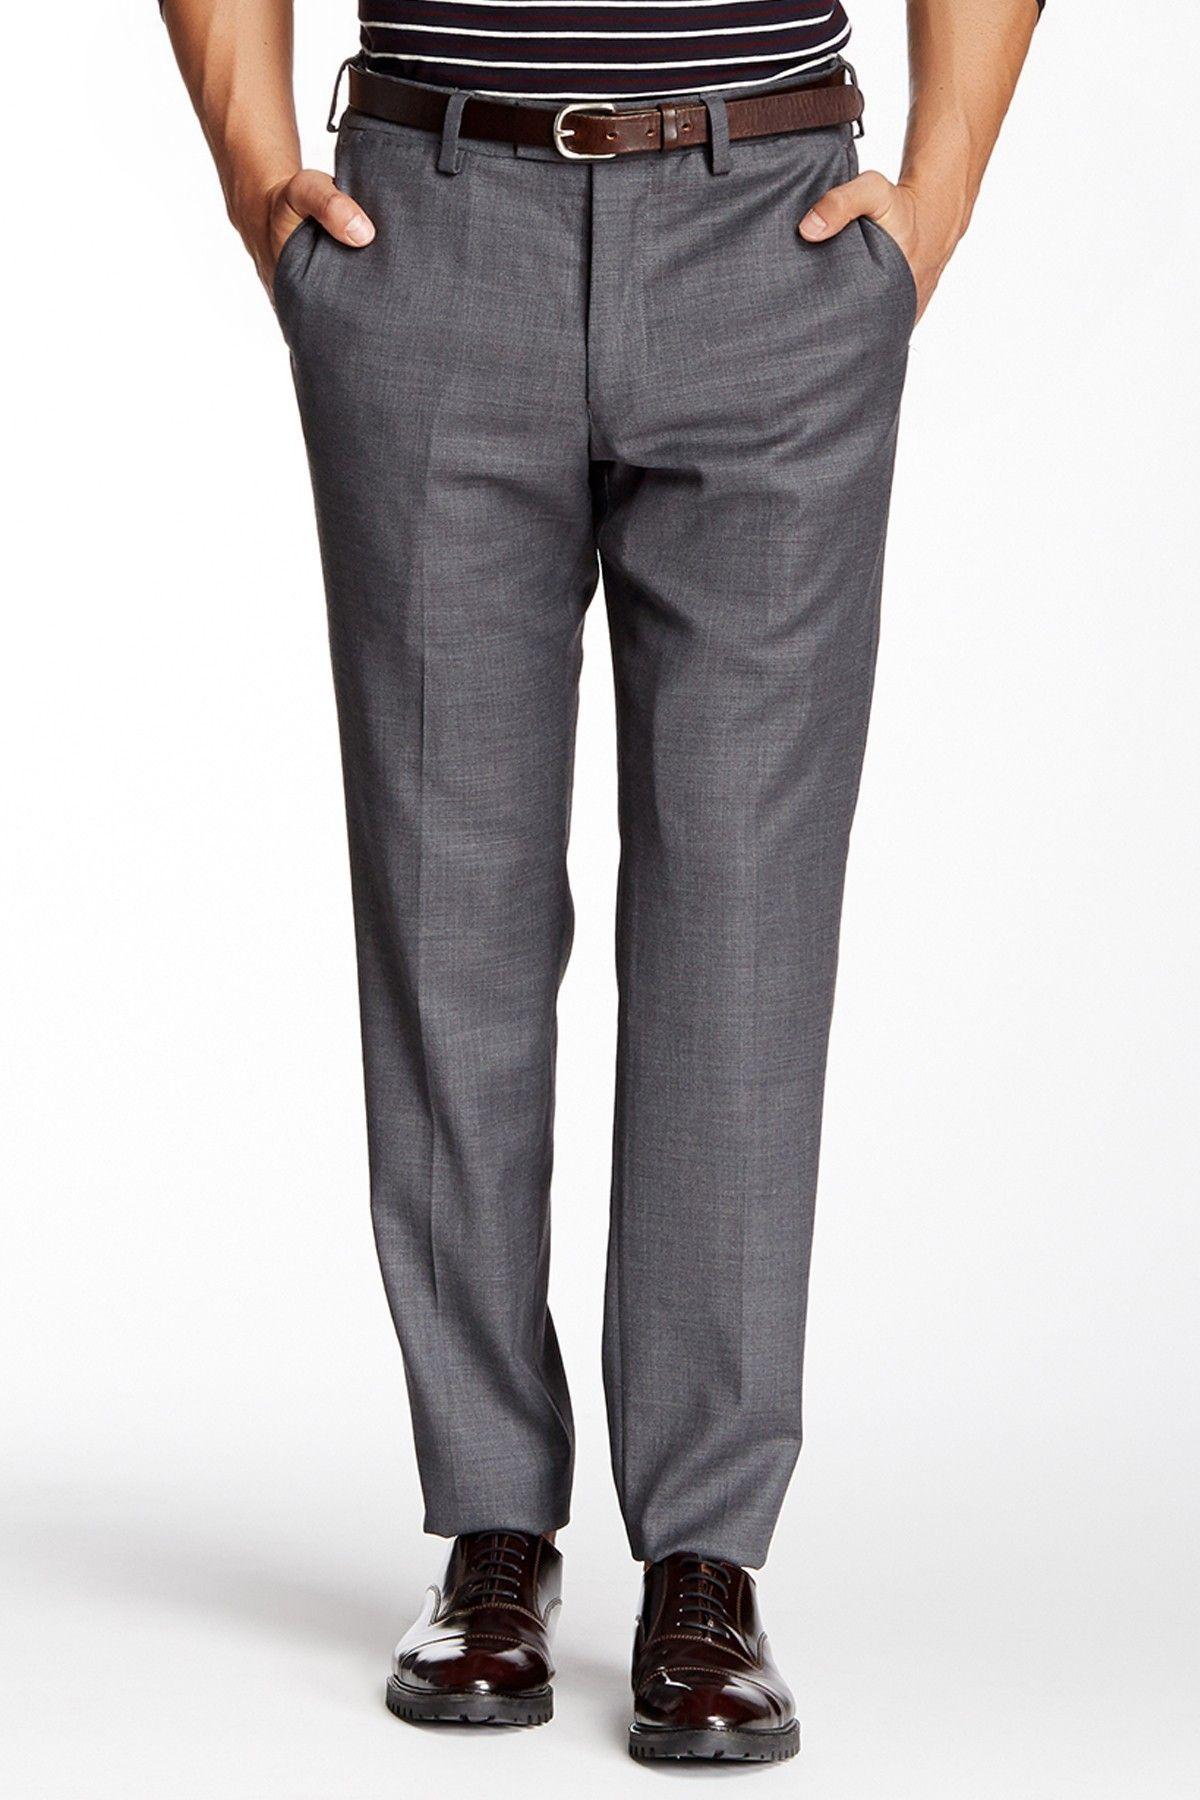 514513fee0 Louis Raphael Solid Stretch Dress Slim Fit Pants - 30-34   Inseam ...